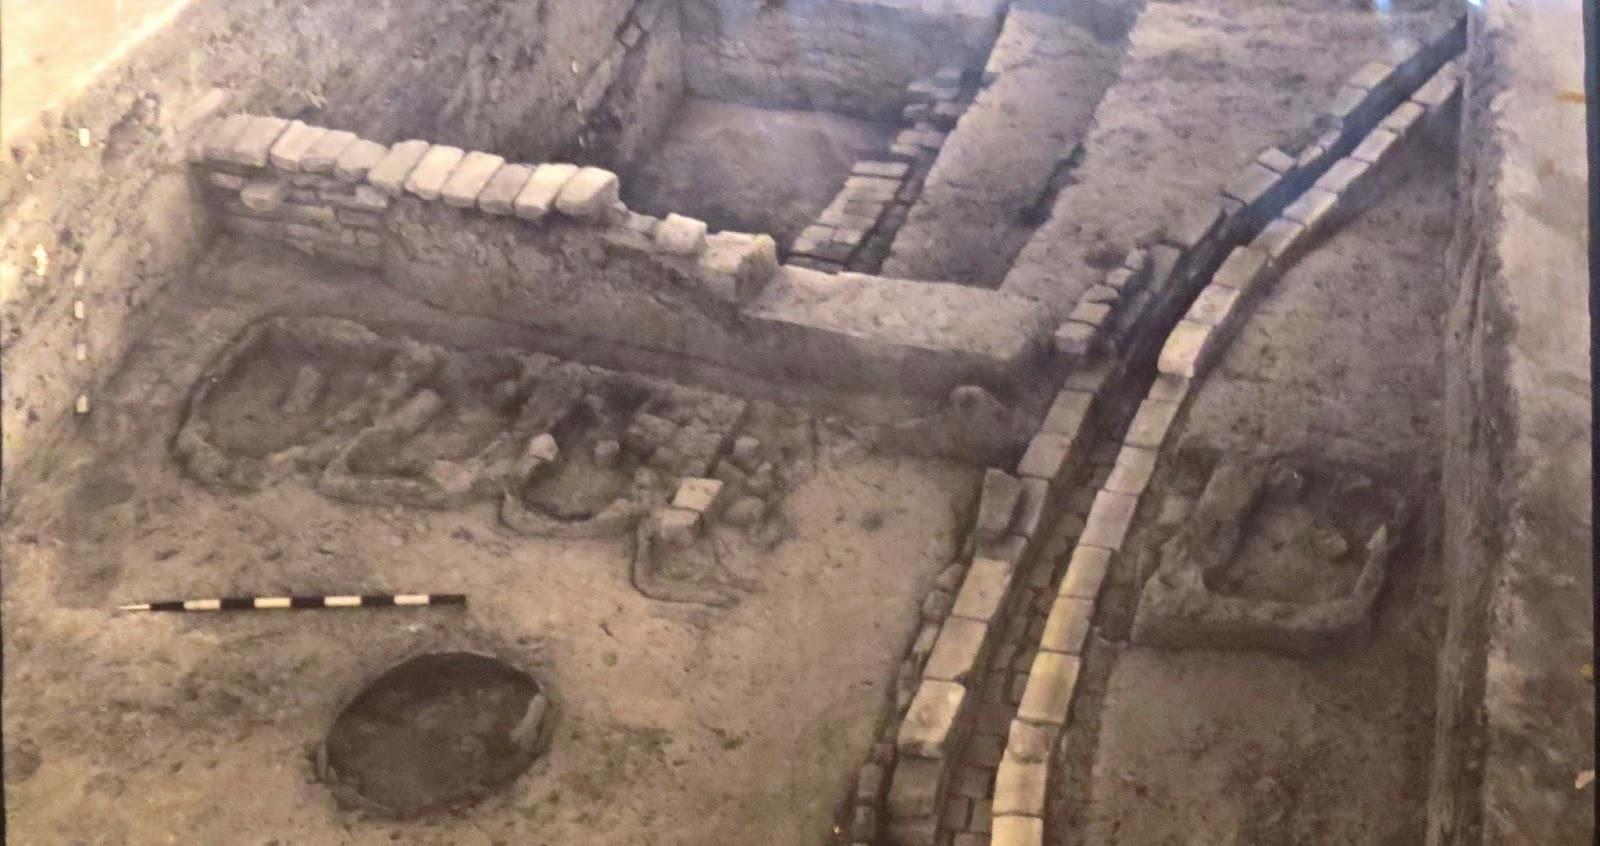 ciudades perdidas en la India Kalibangan, Rajasthan india